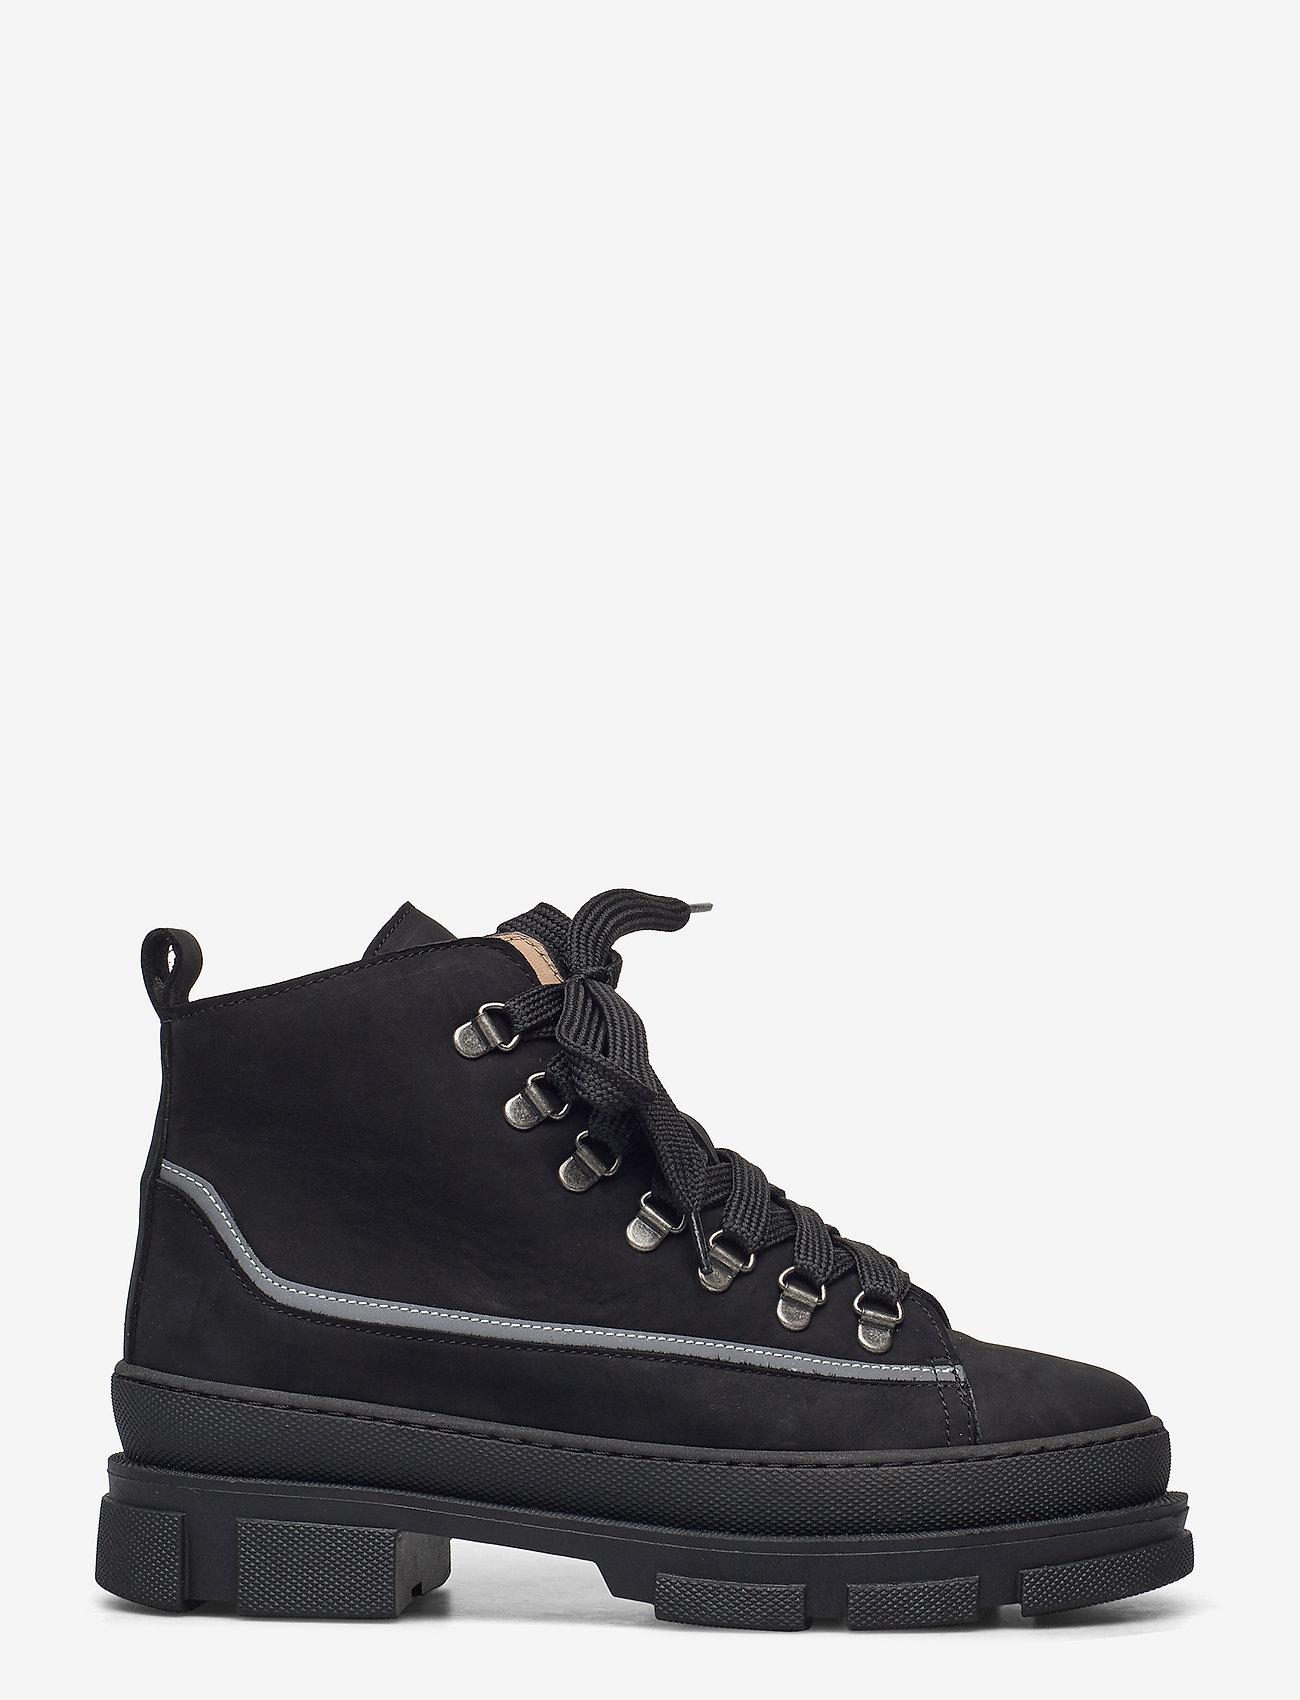 ANGULUS - Boots - flat - flache stiefeletten - 1205/2012/1205 black/reflex/bl - 1